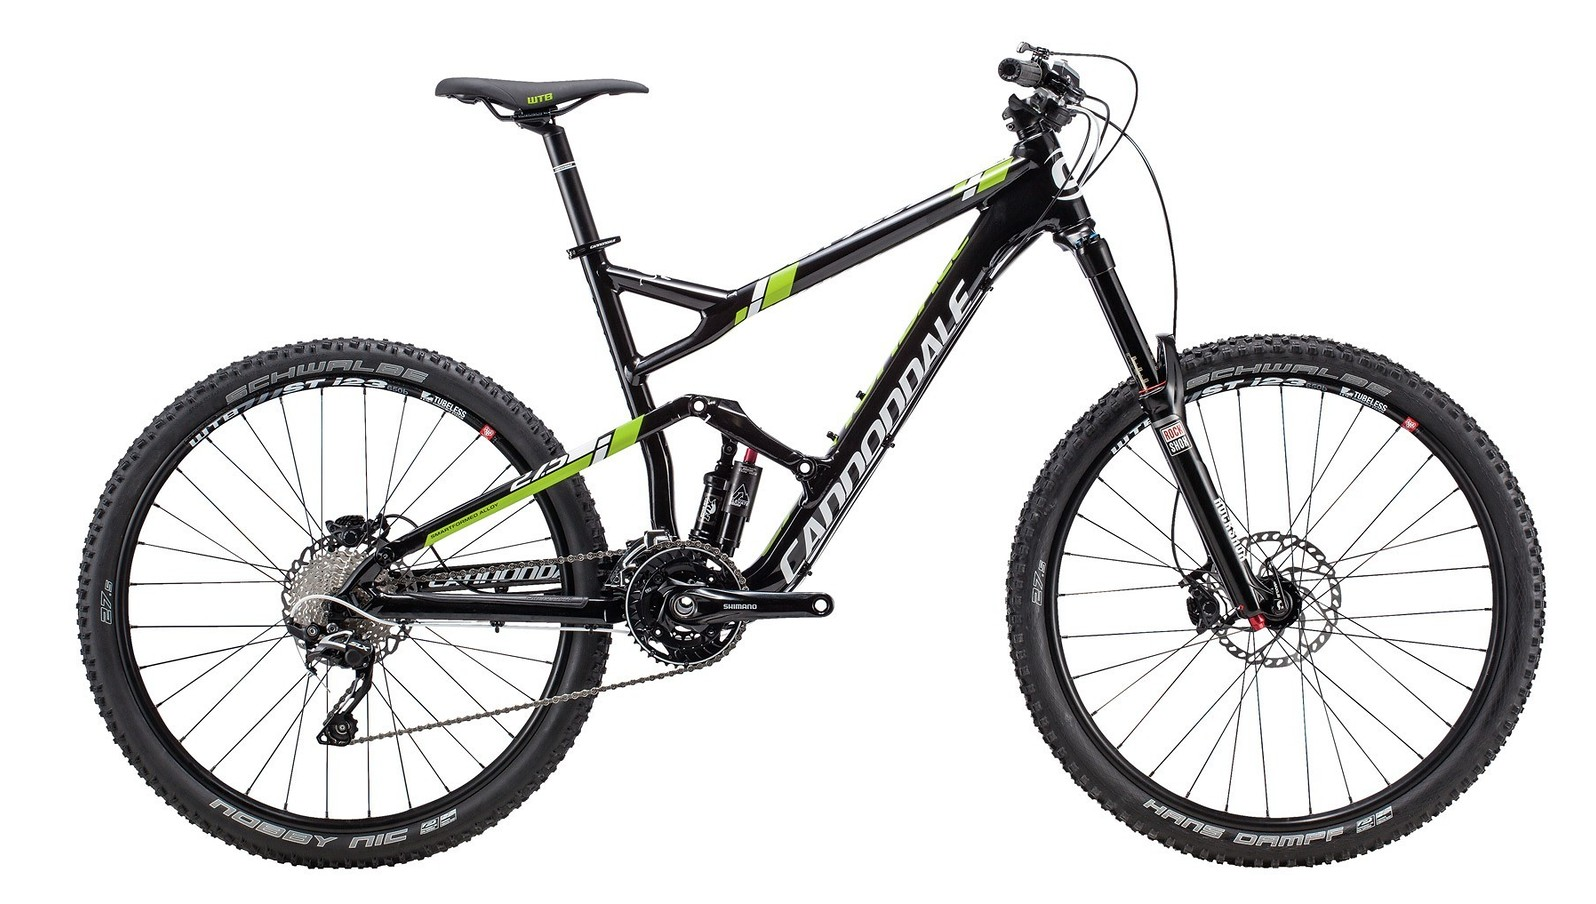 2015 Cannondale Jekyll 27.5 4 Bike